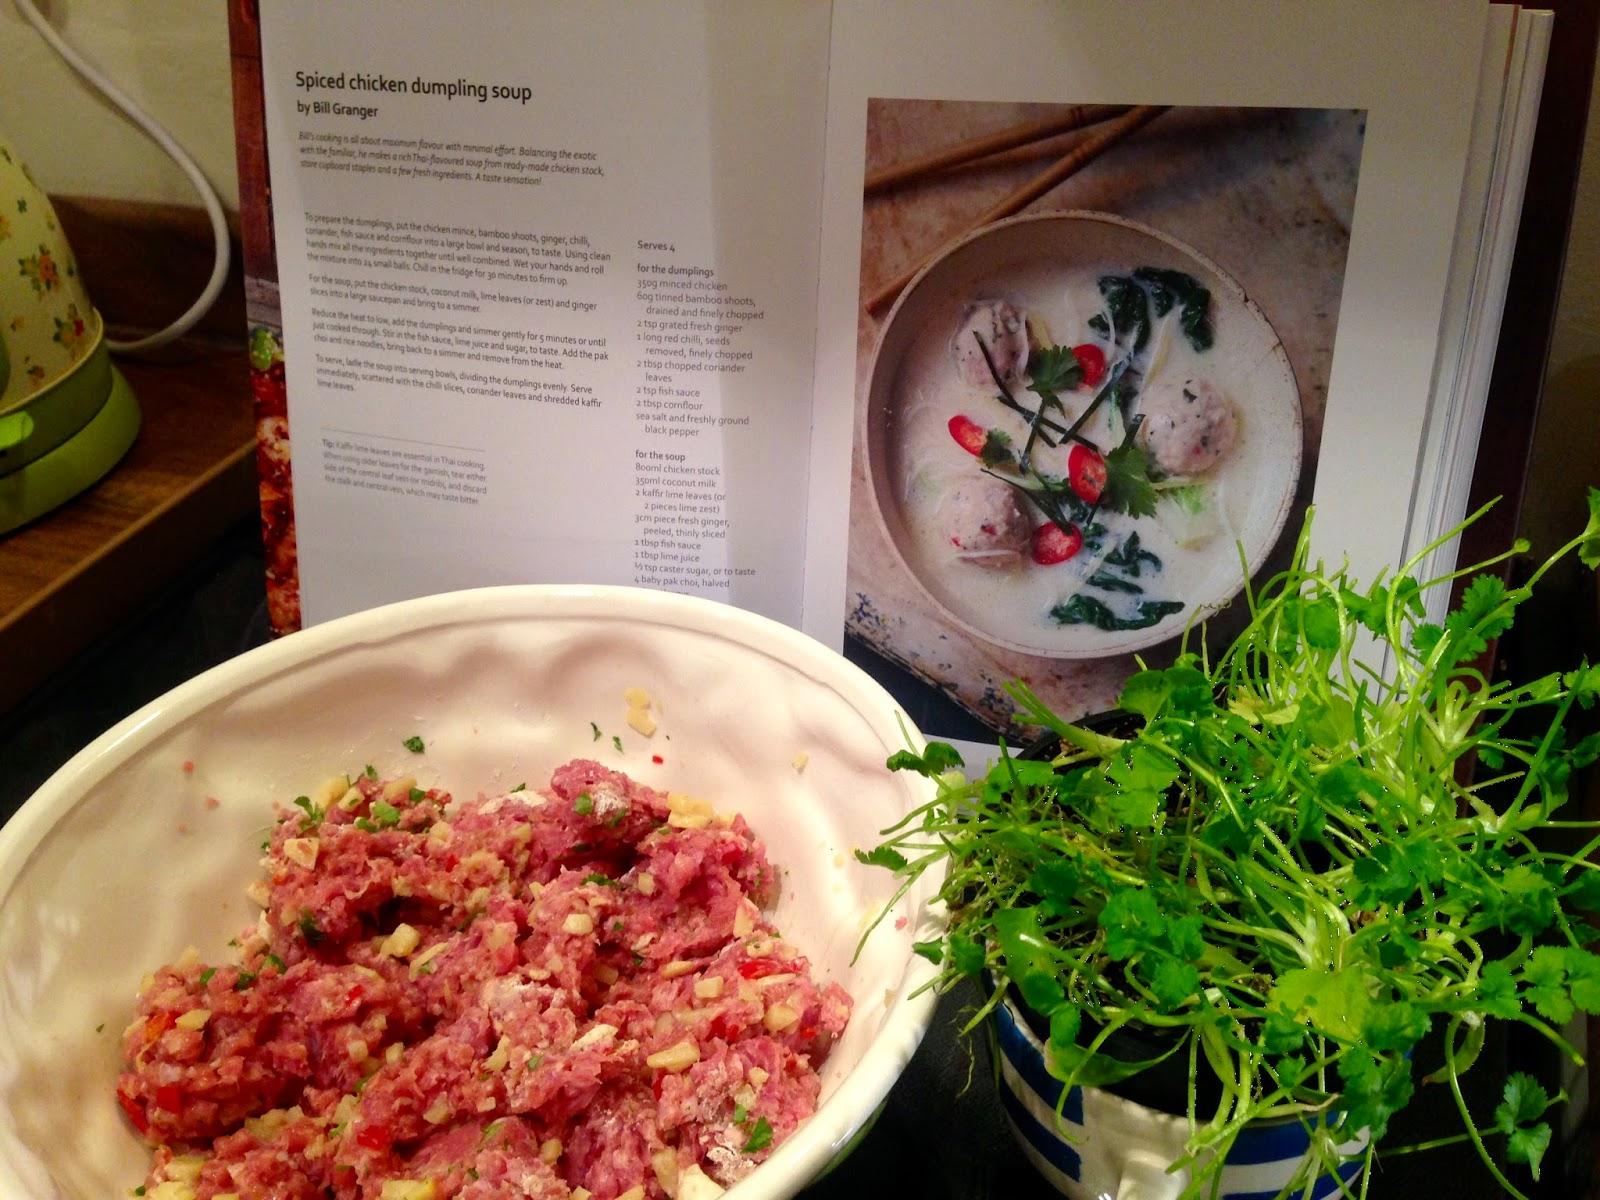 Bill Granger cook book and  Spiced chicken dumpling ingredients